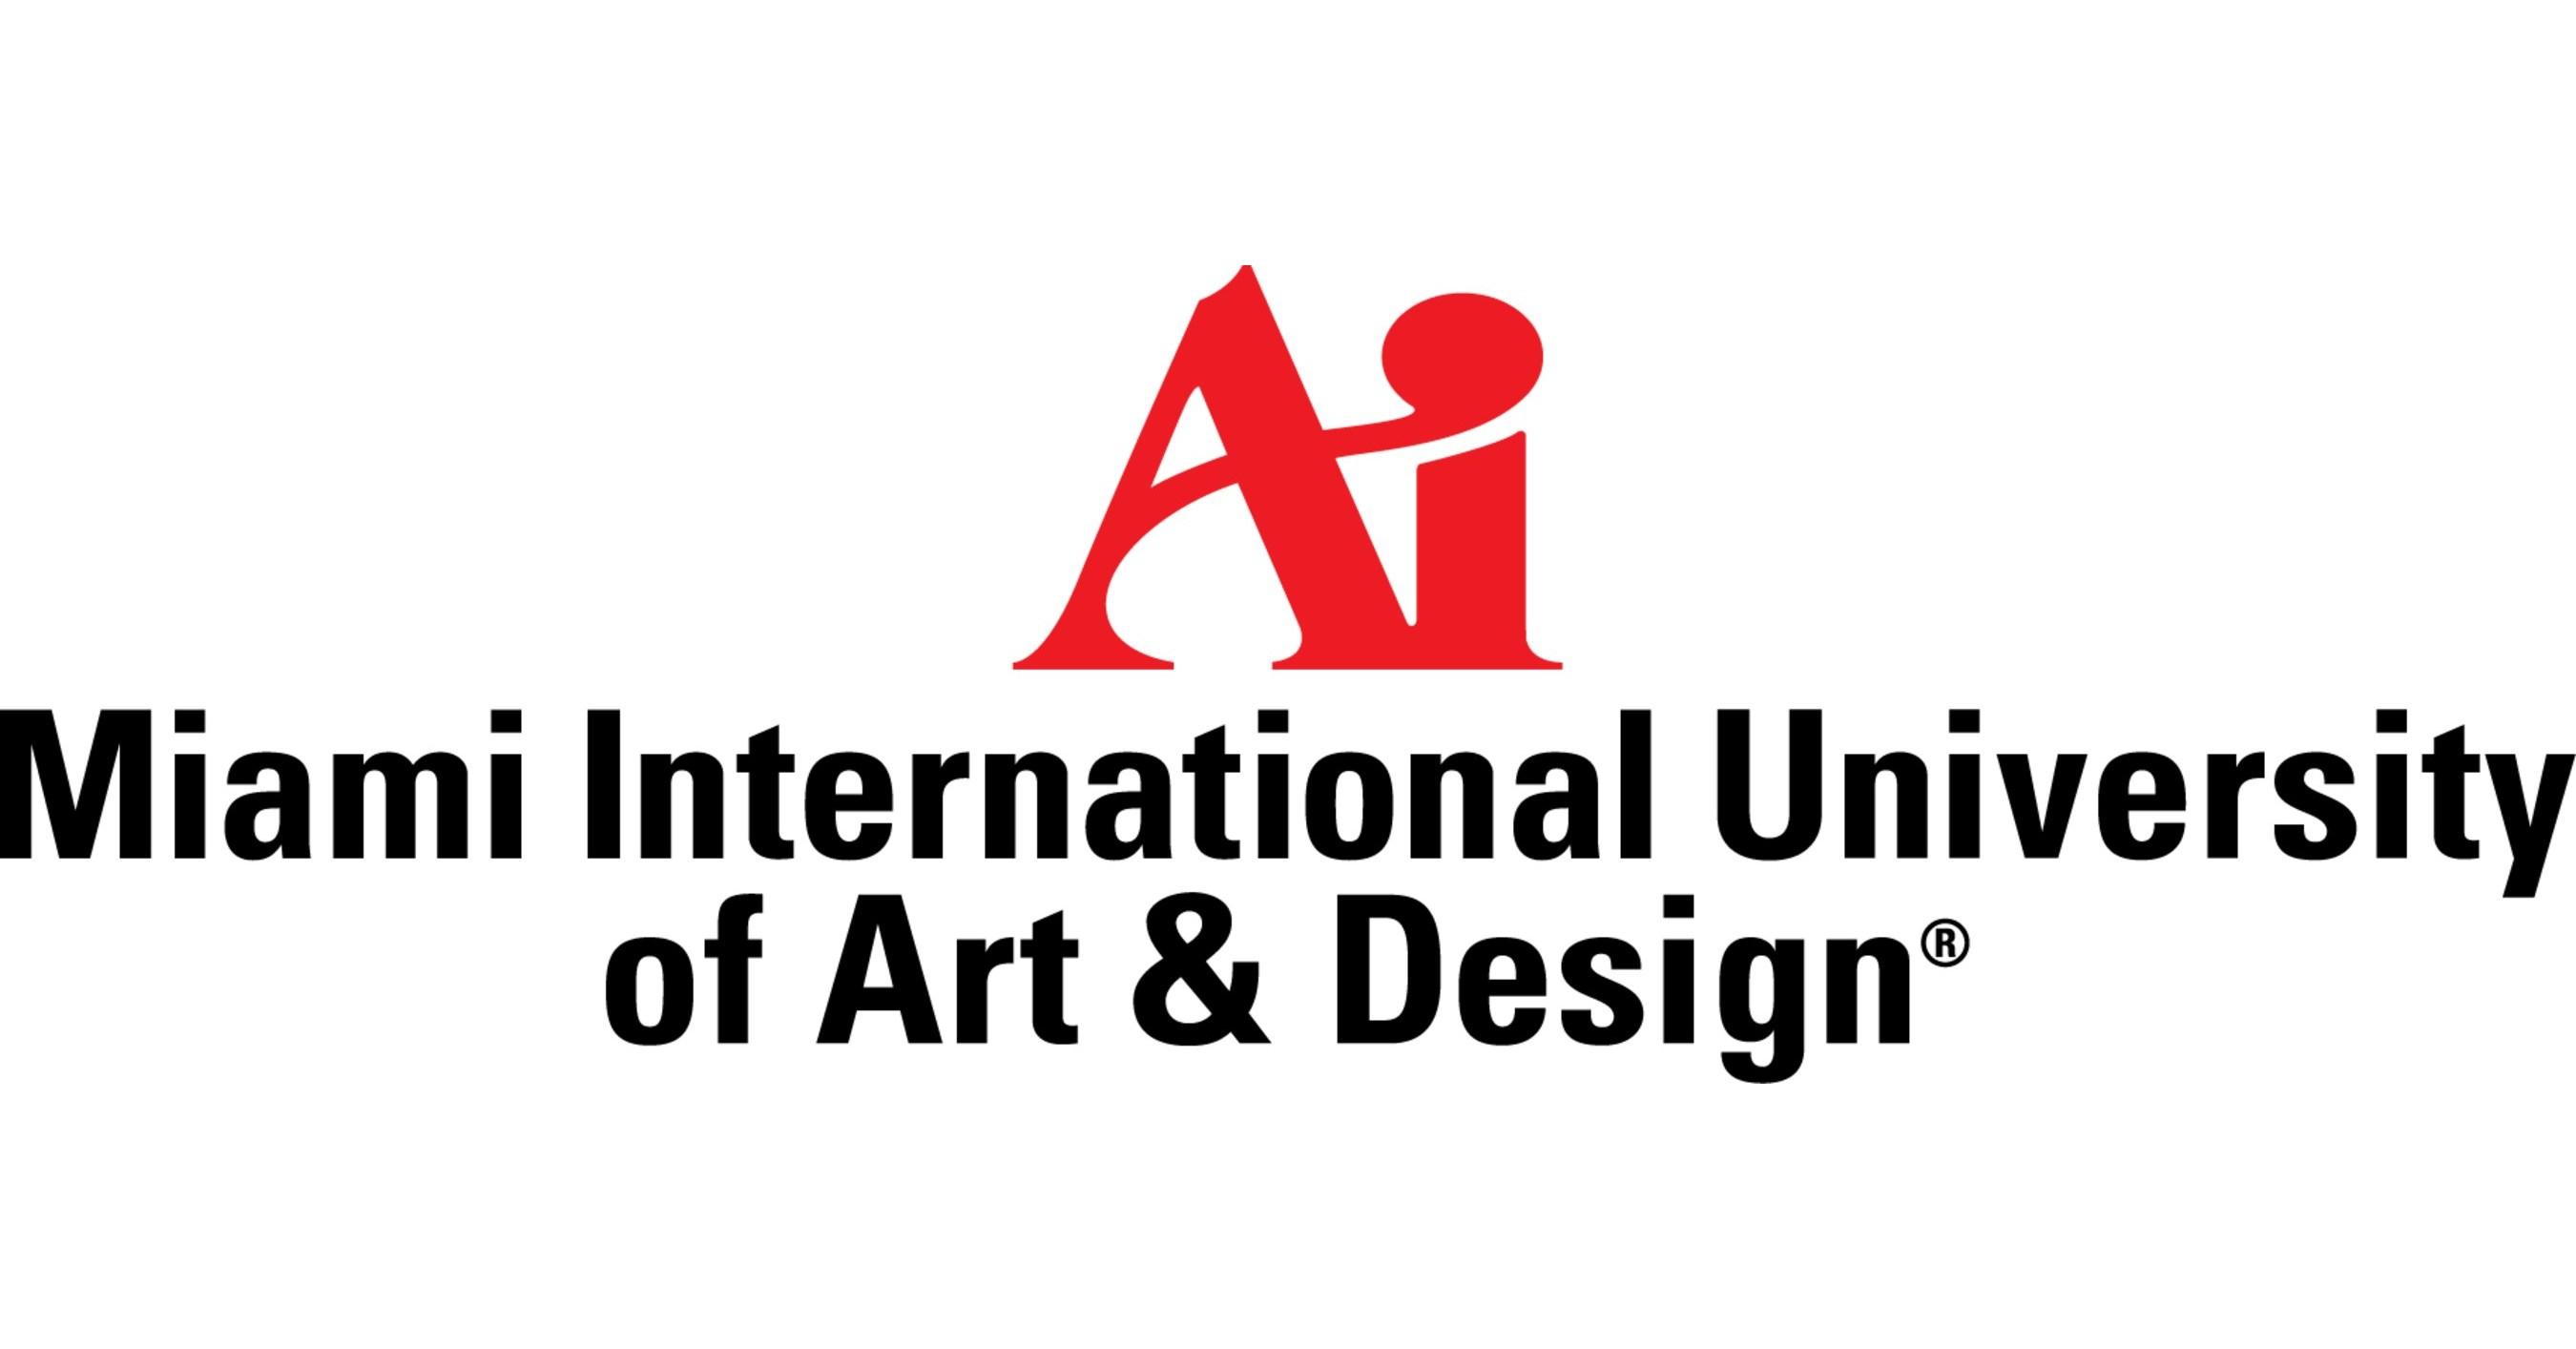 The Business Of Fashion Bof Names Miami International University Of Art Design To 2019 Best School Global List For Undergraduate Fashion Design Programs